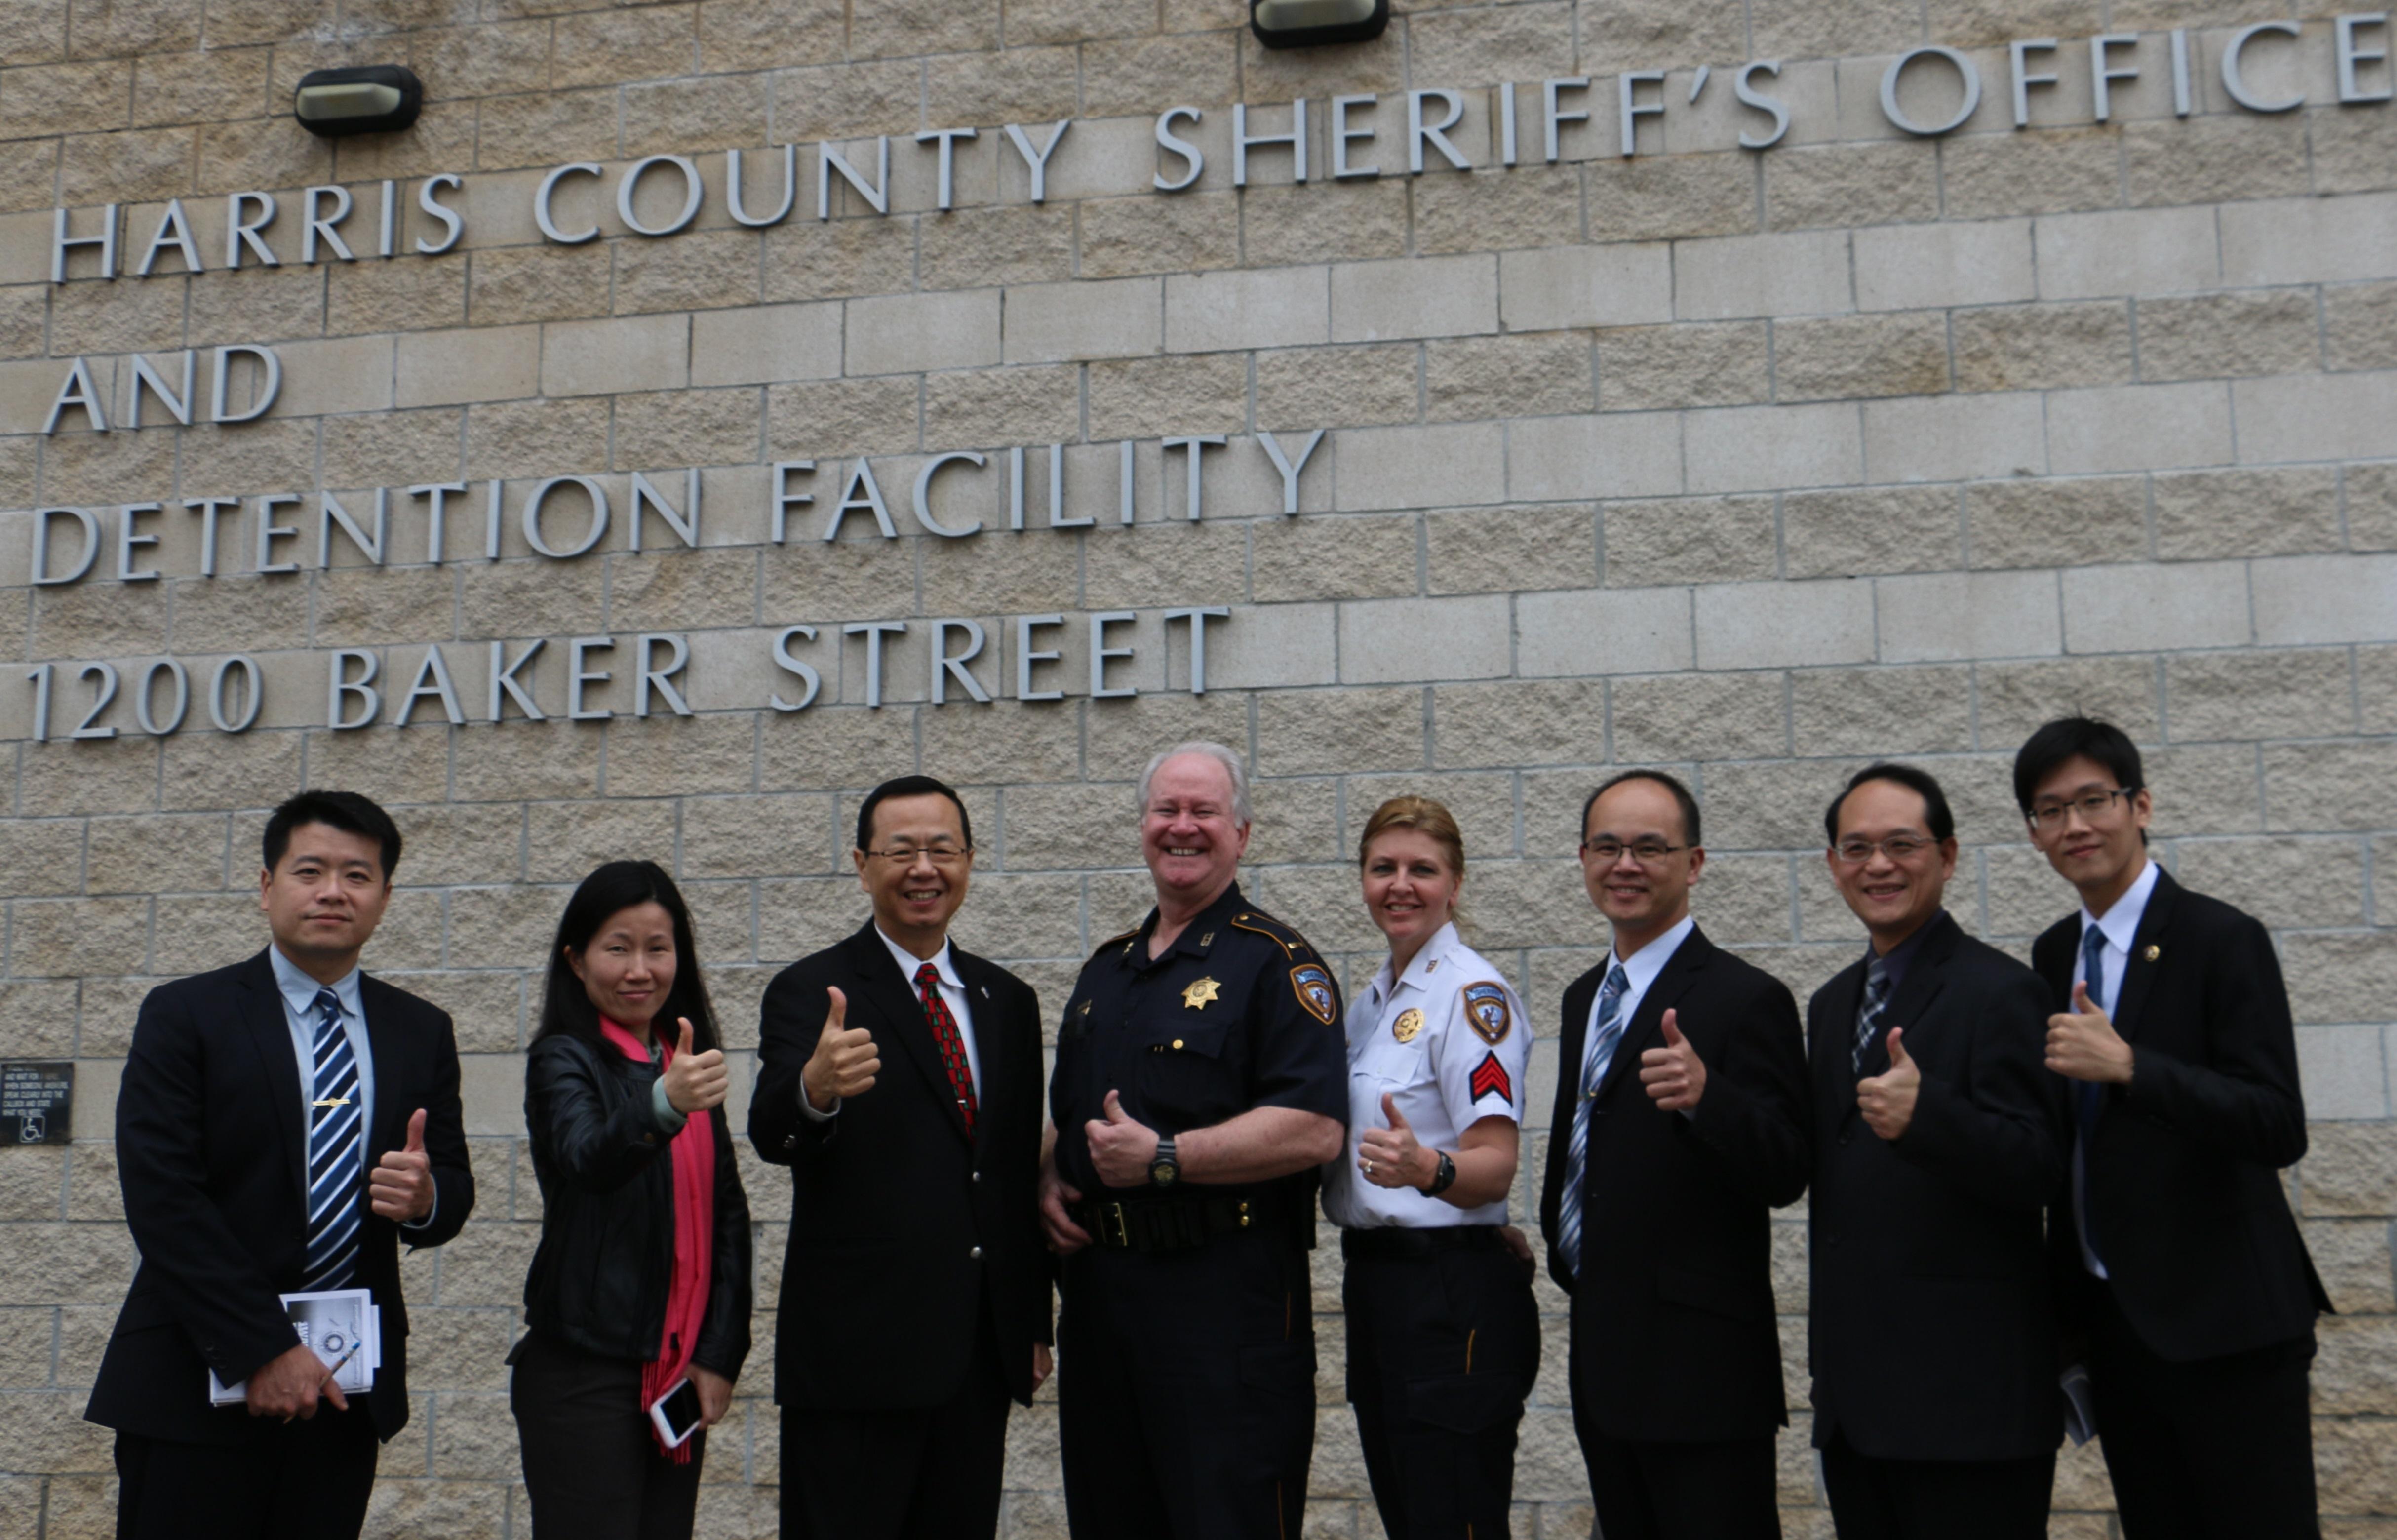 Jail tour group photo.